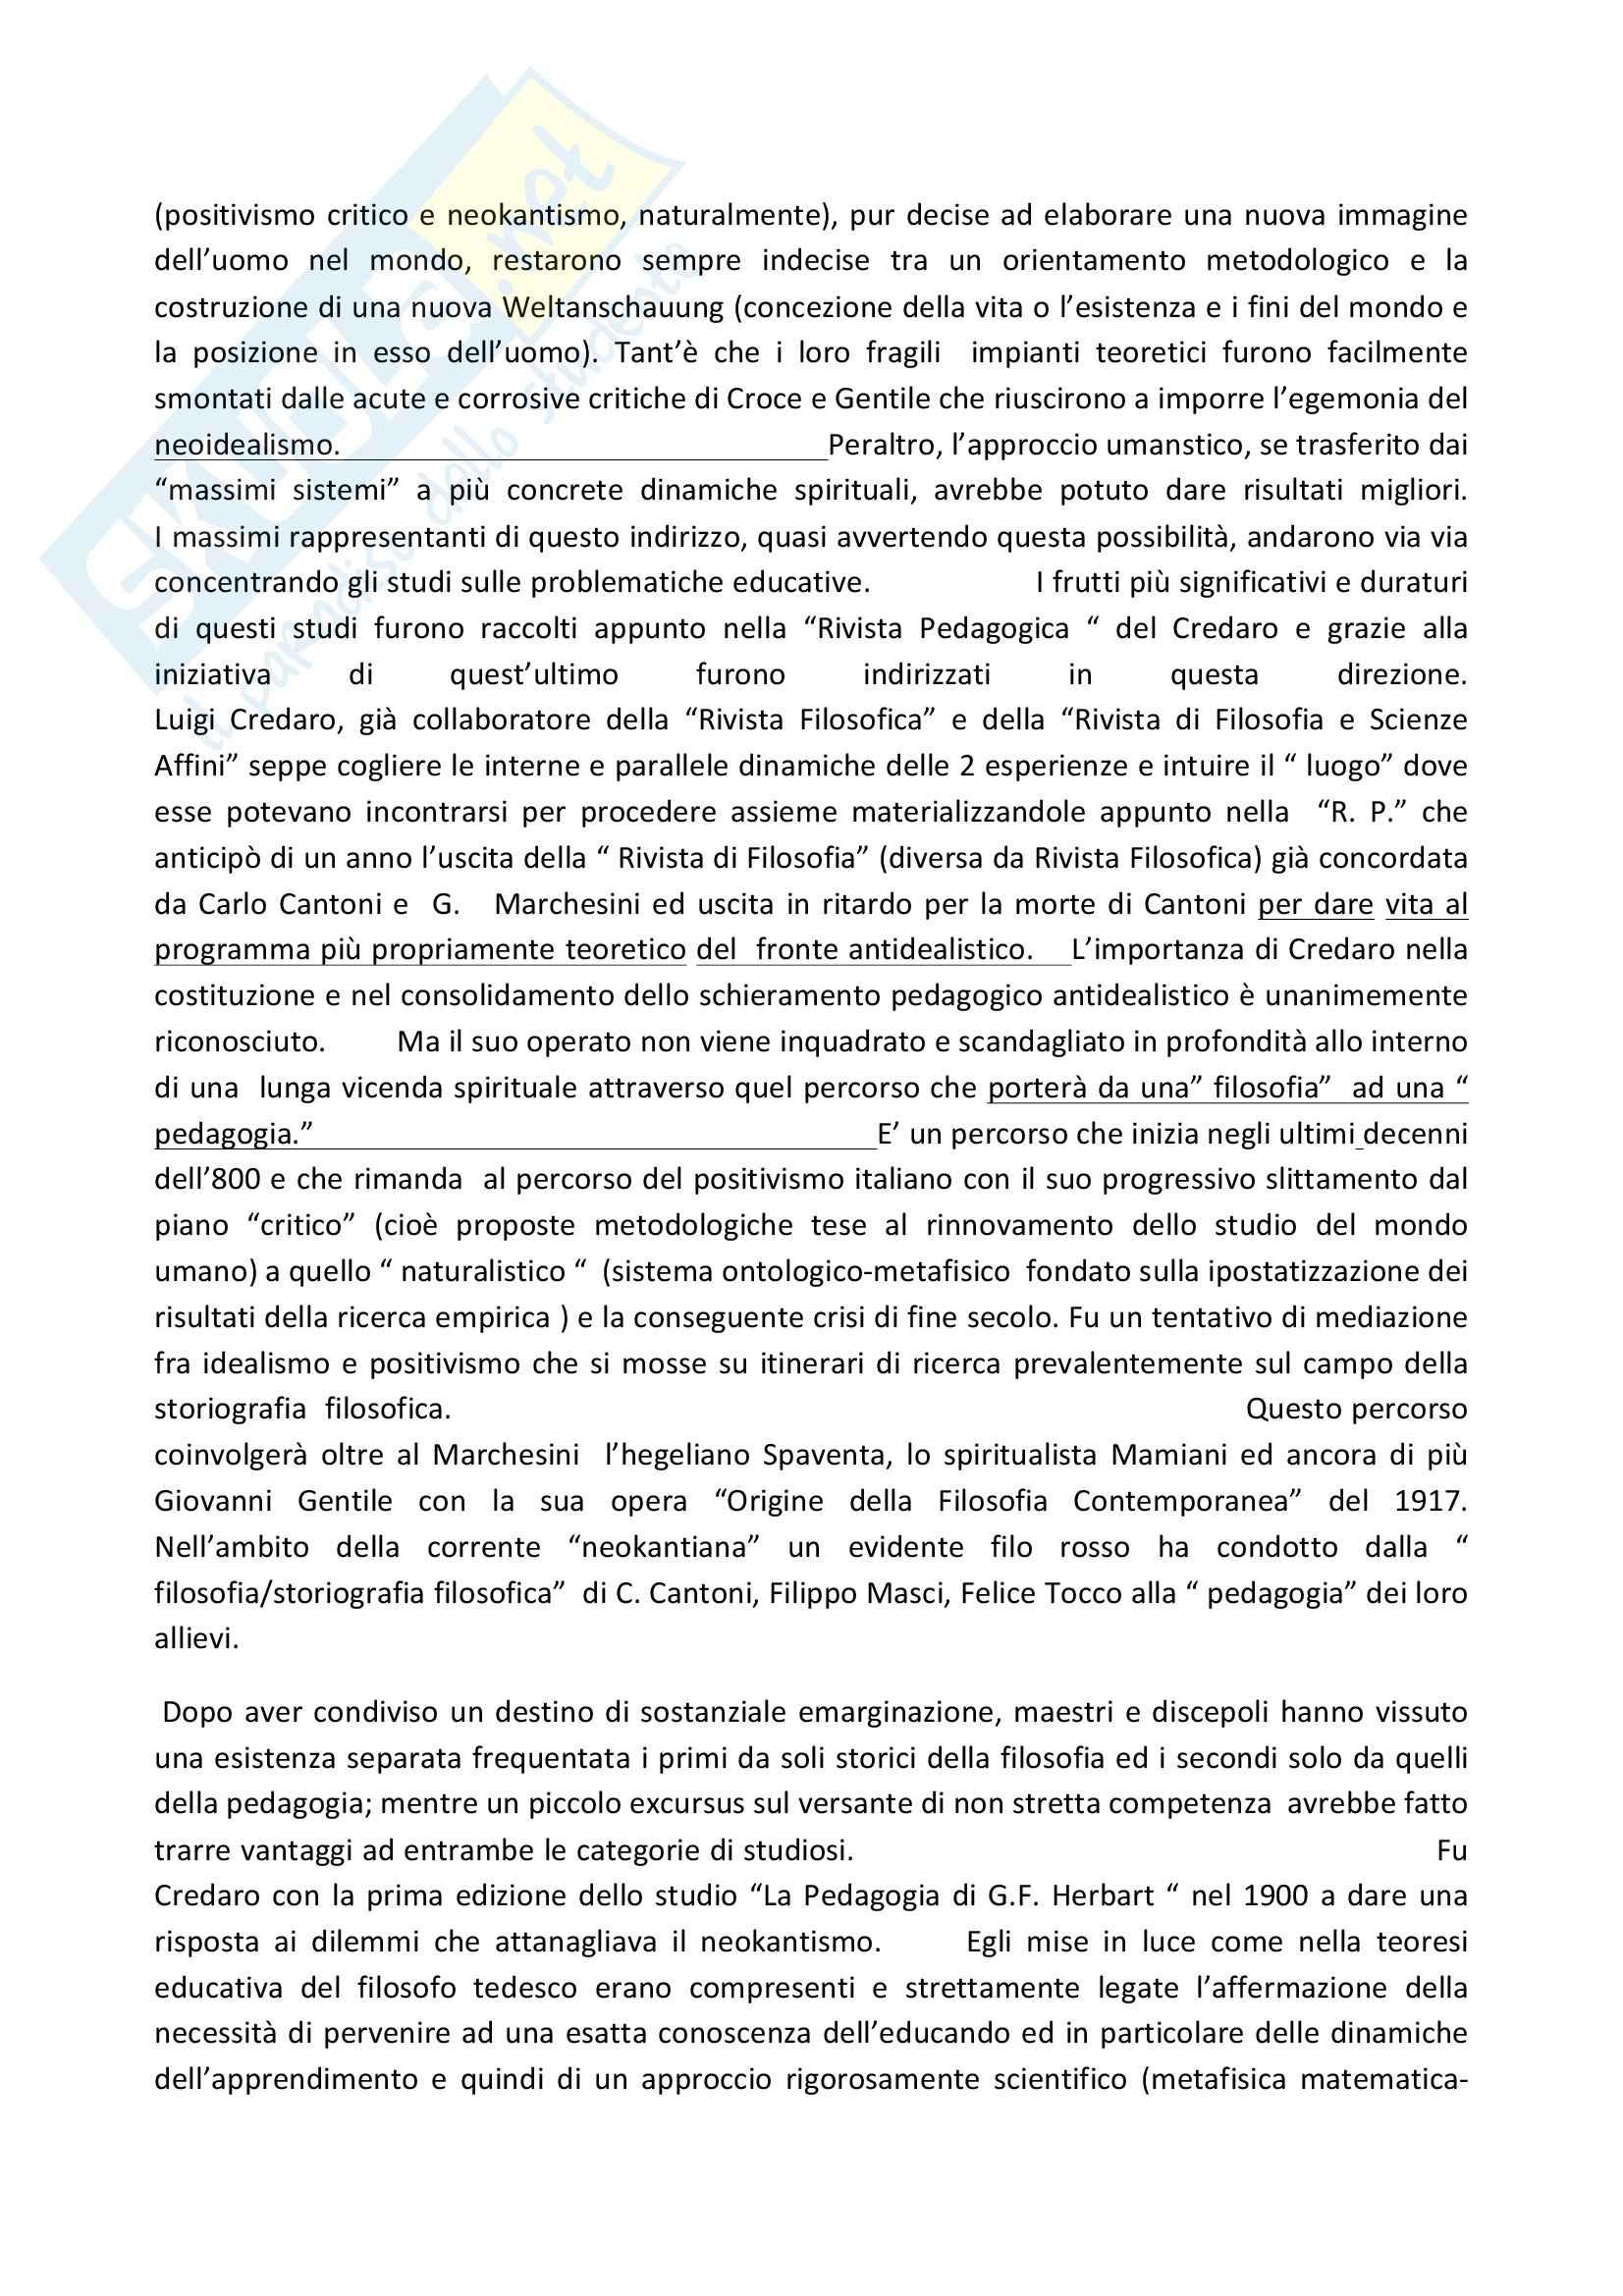 Riassunto esame Pedagogia generale, prof. D'Arcangeli, libro consigliato Luigi Credaro e la Rivista Pedagogica (1908-1939), D'Arcangeli Pag. 2